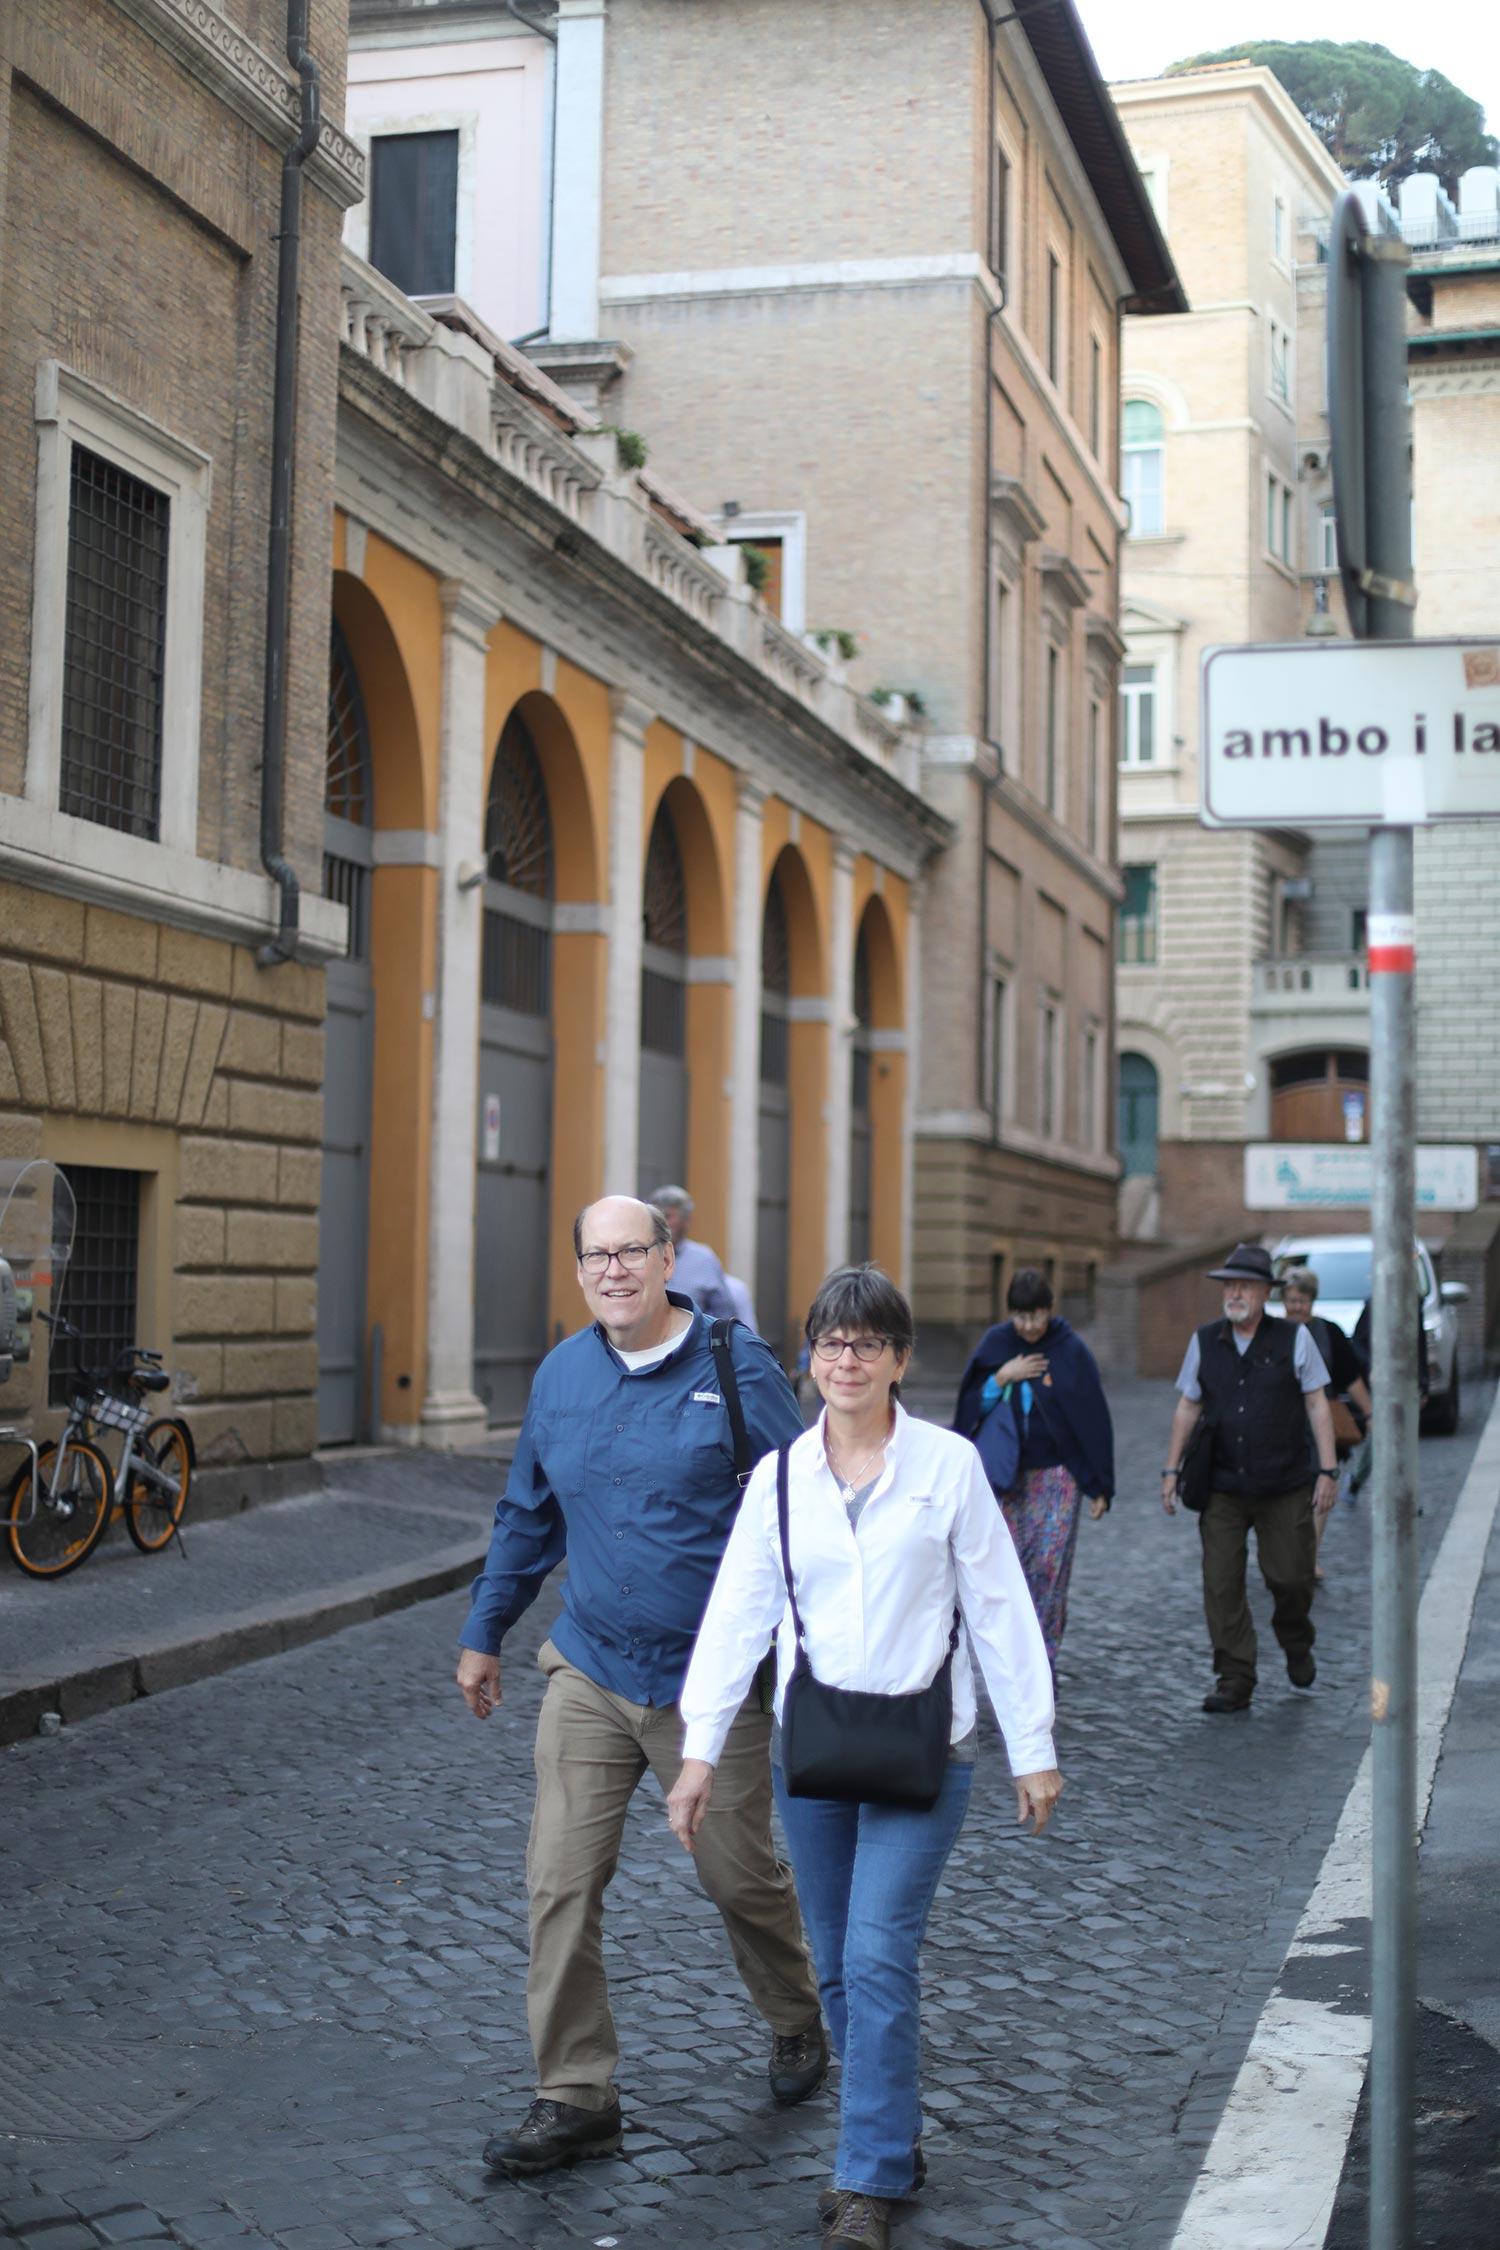 Pilgrimage_Rome_3211_Rome.jpg